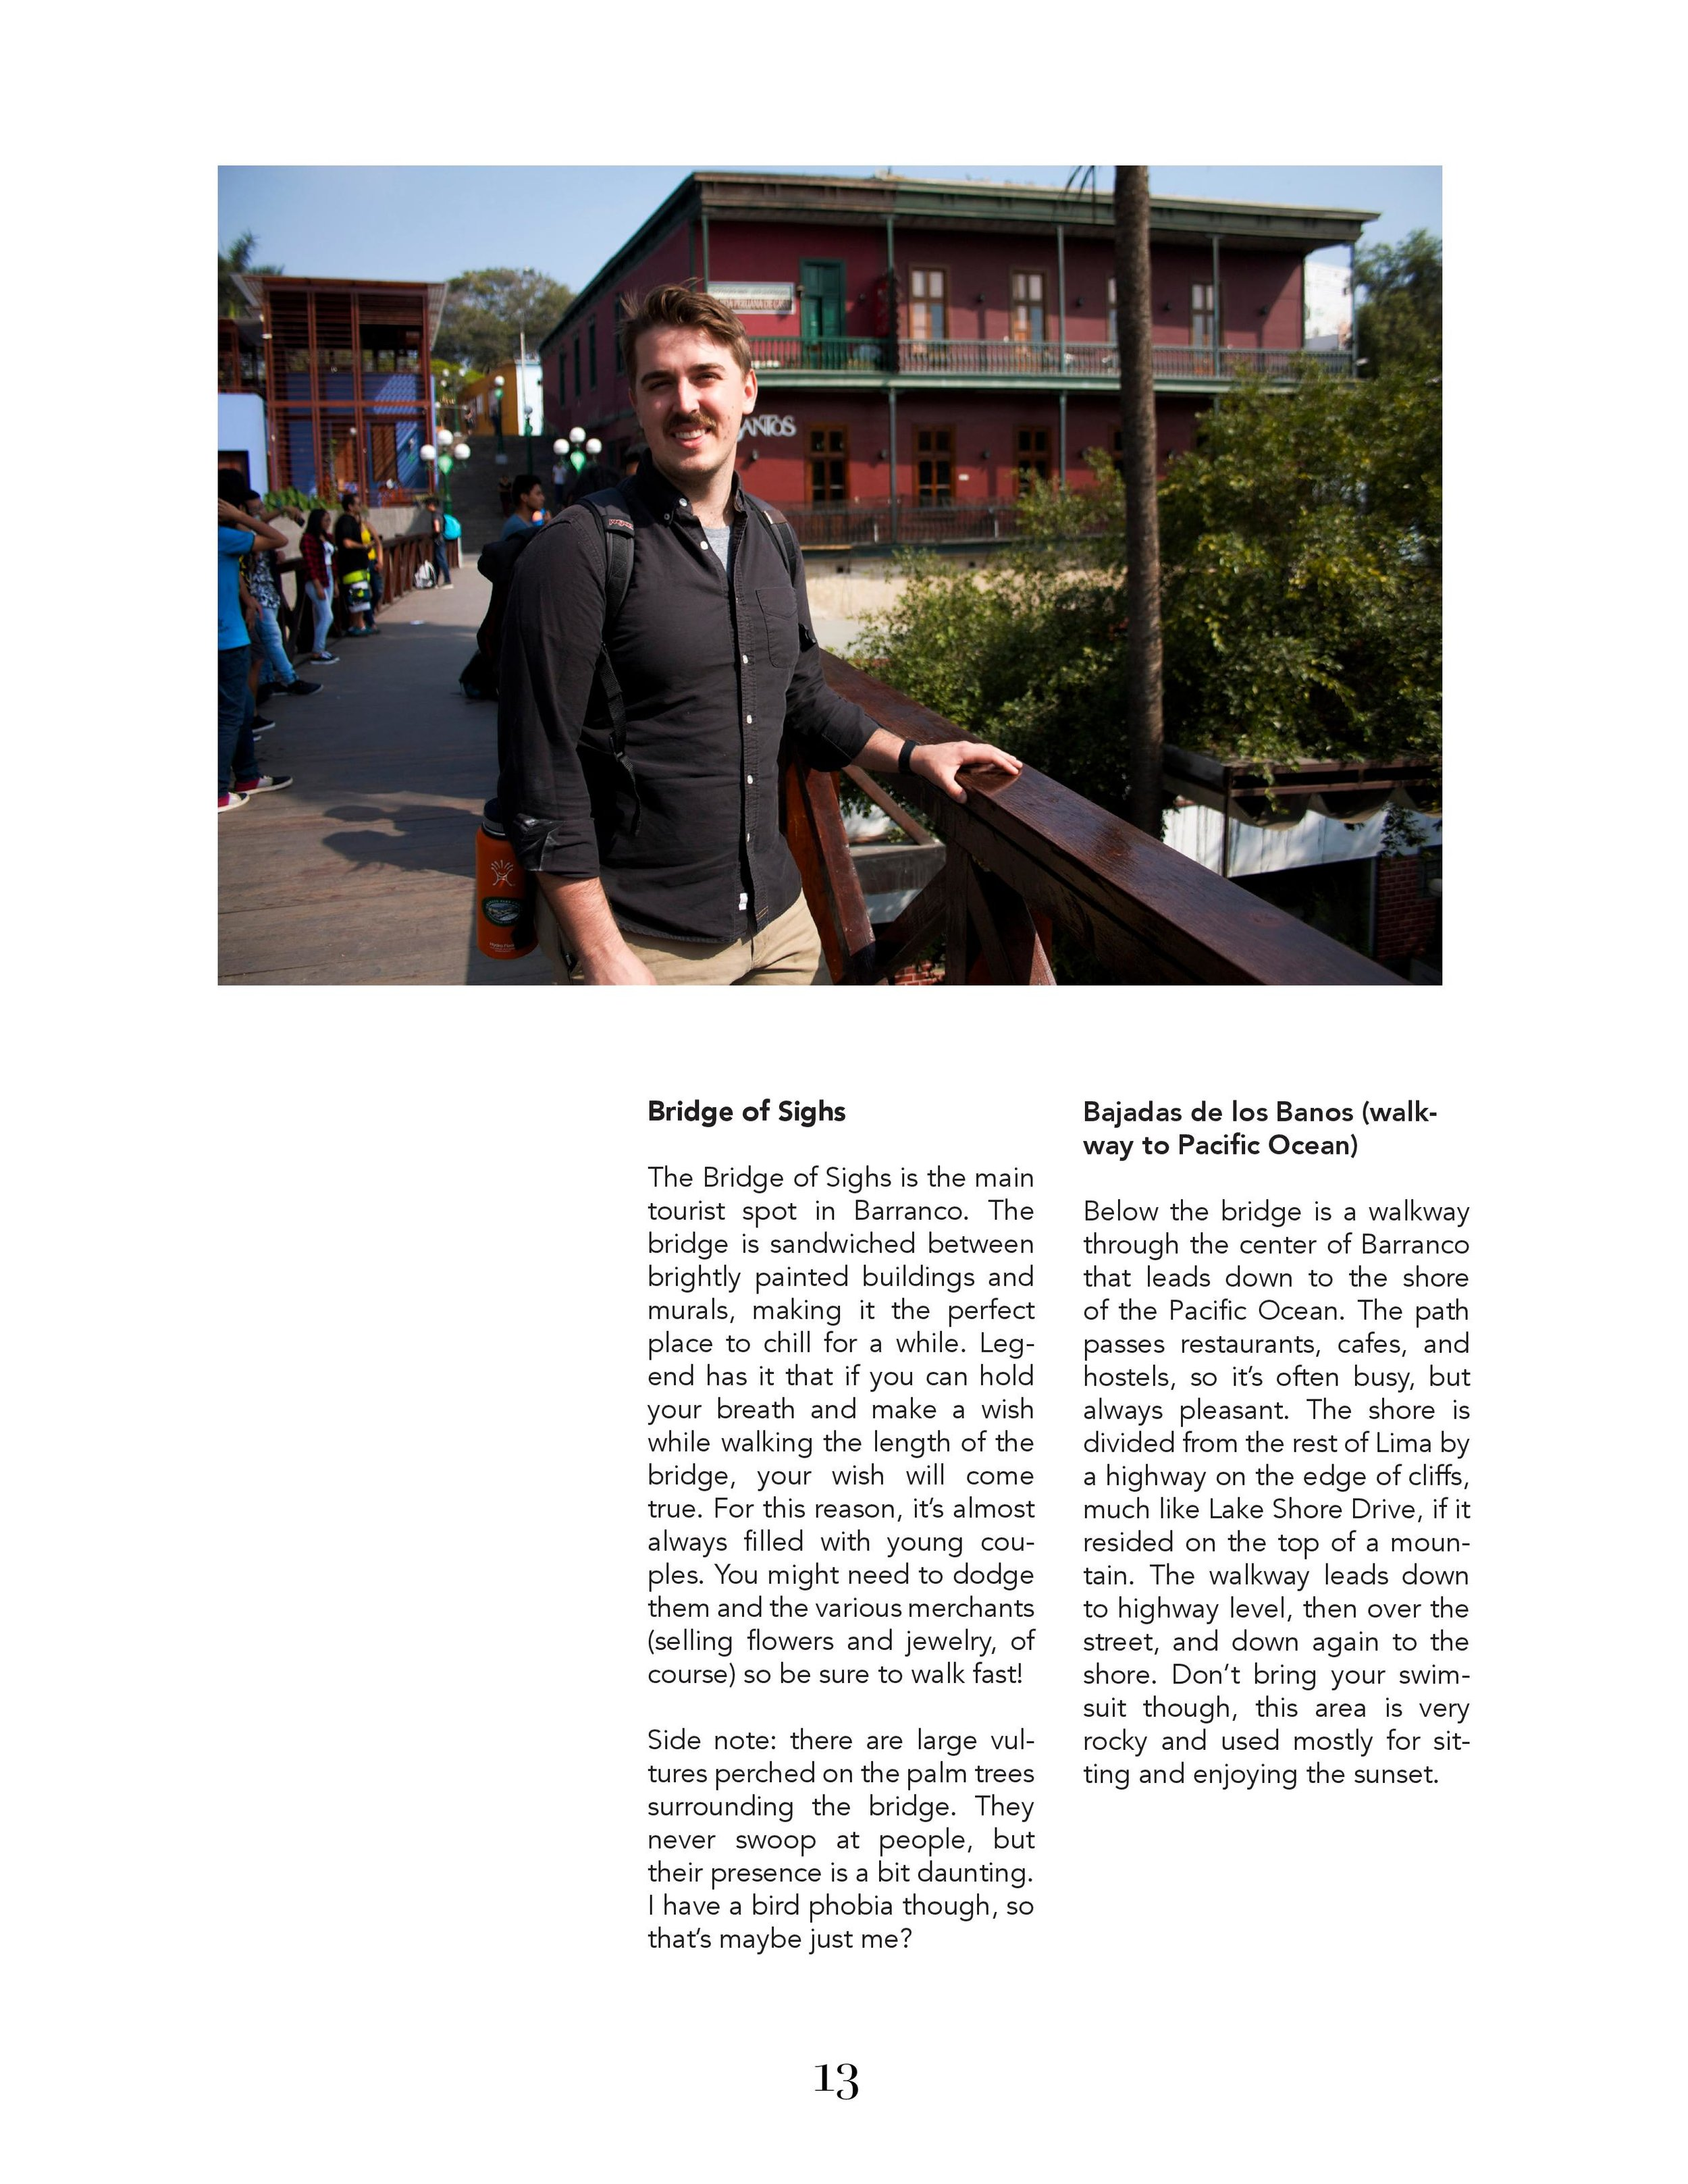 barrio_5.22-page-013.jpg